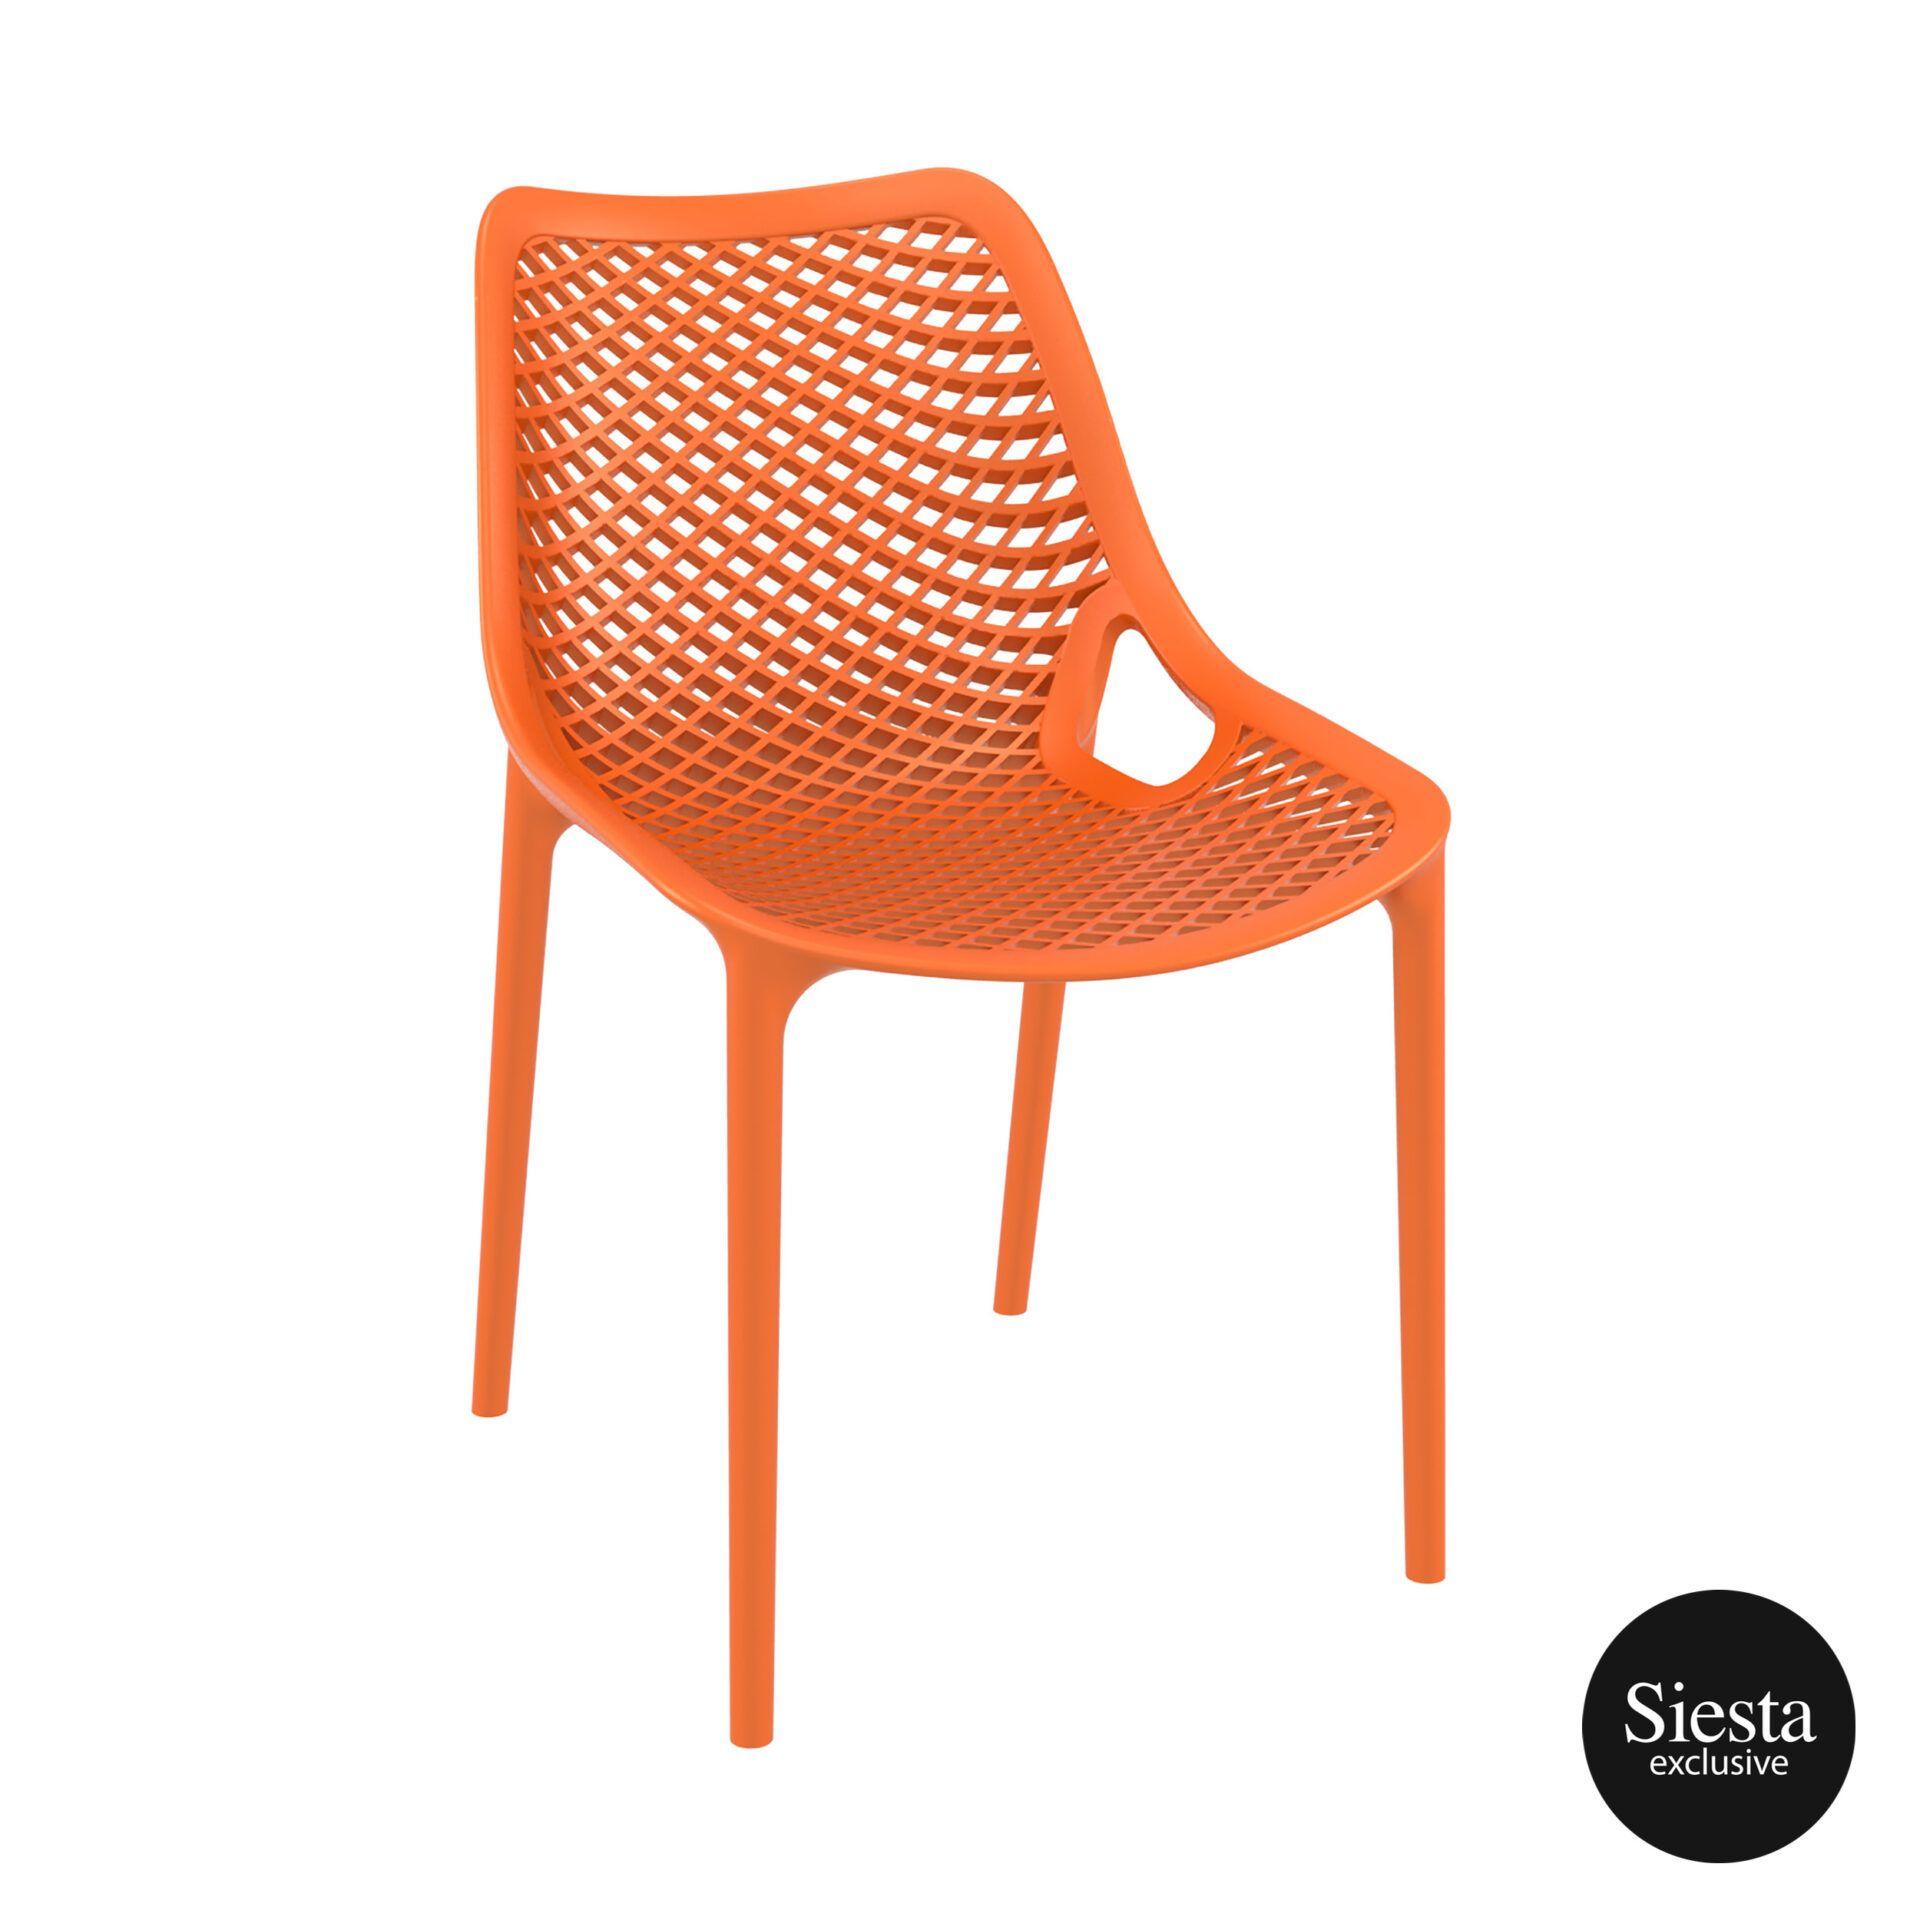 original siesta air chair orange front side 1